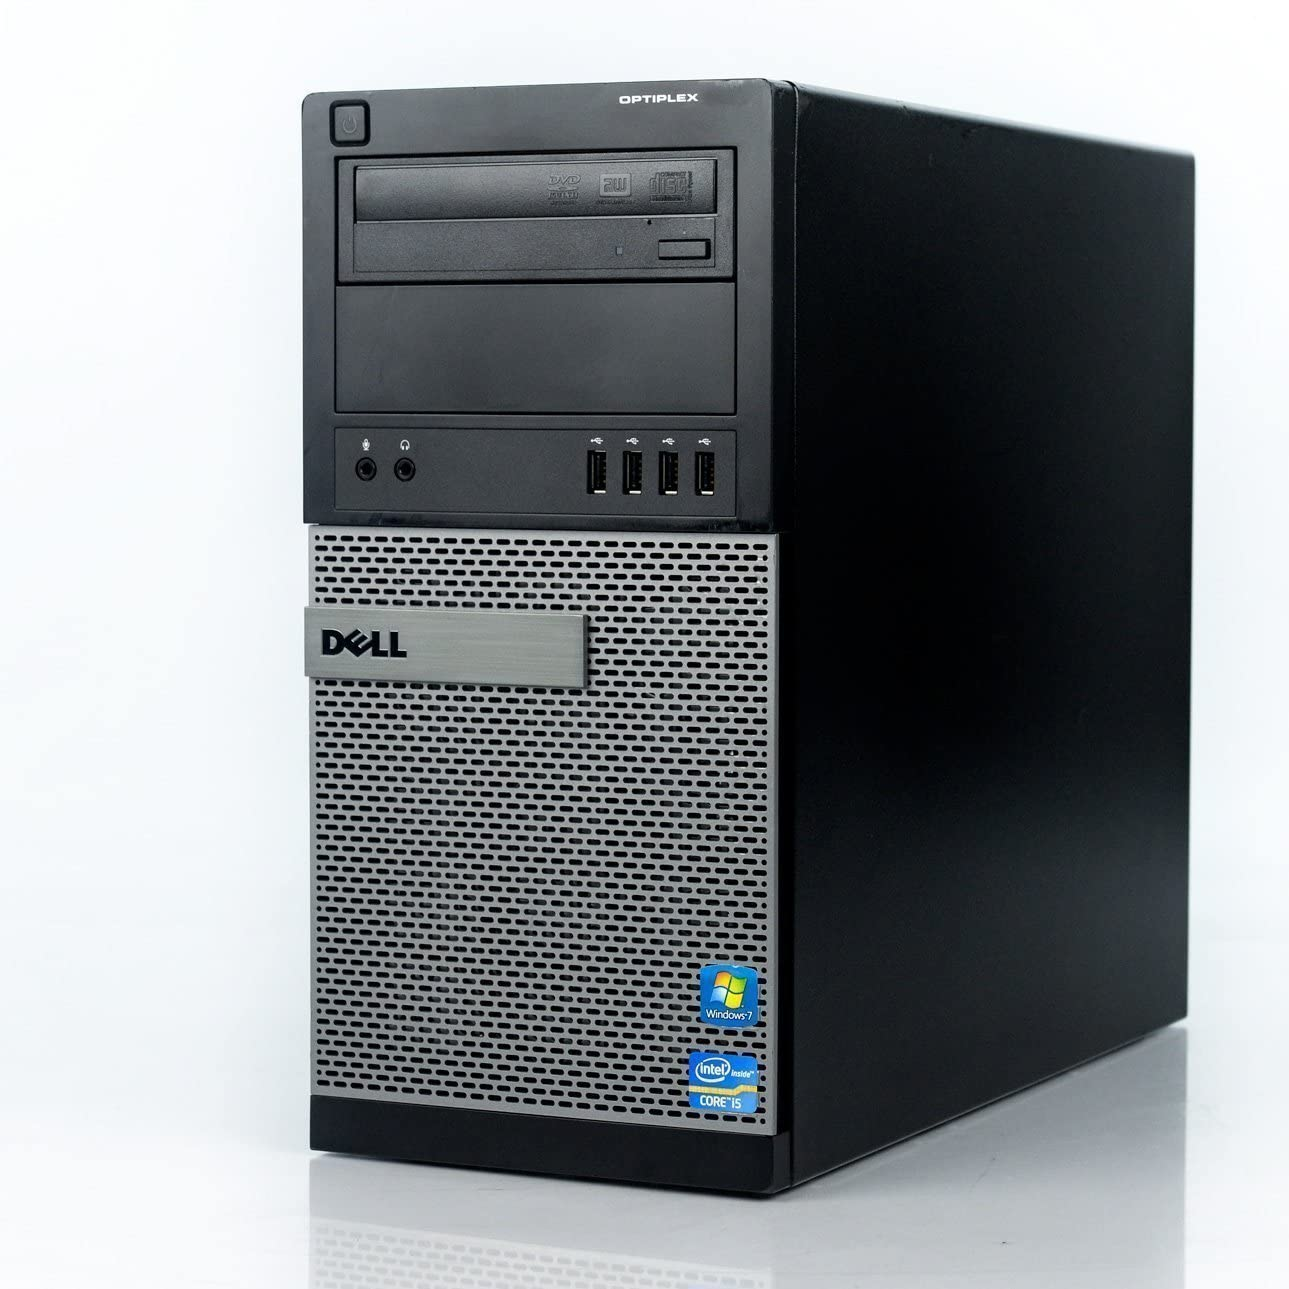 Dell Optiplex 9010 Tower Premium Business Challenge the lowest price Desktop Inte Mesa Mall Computer